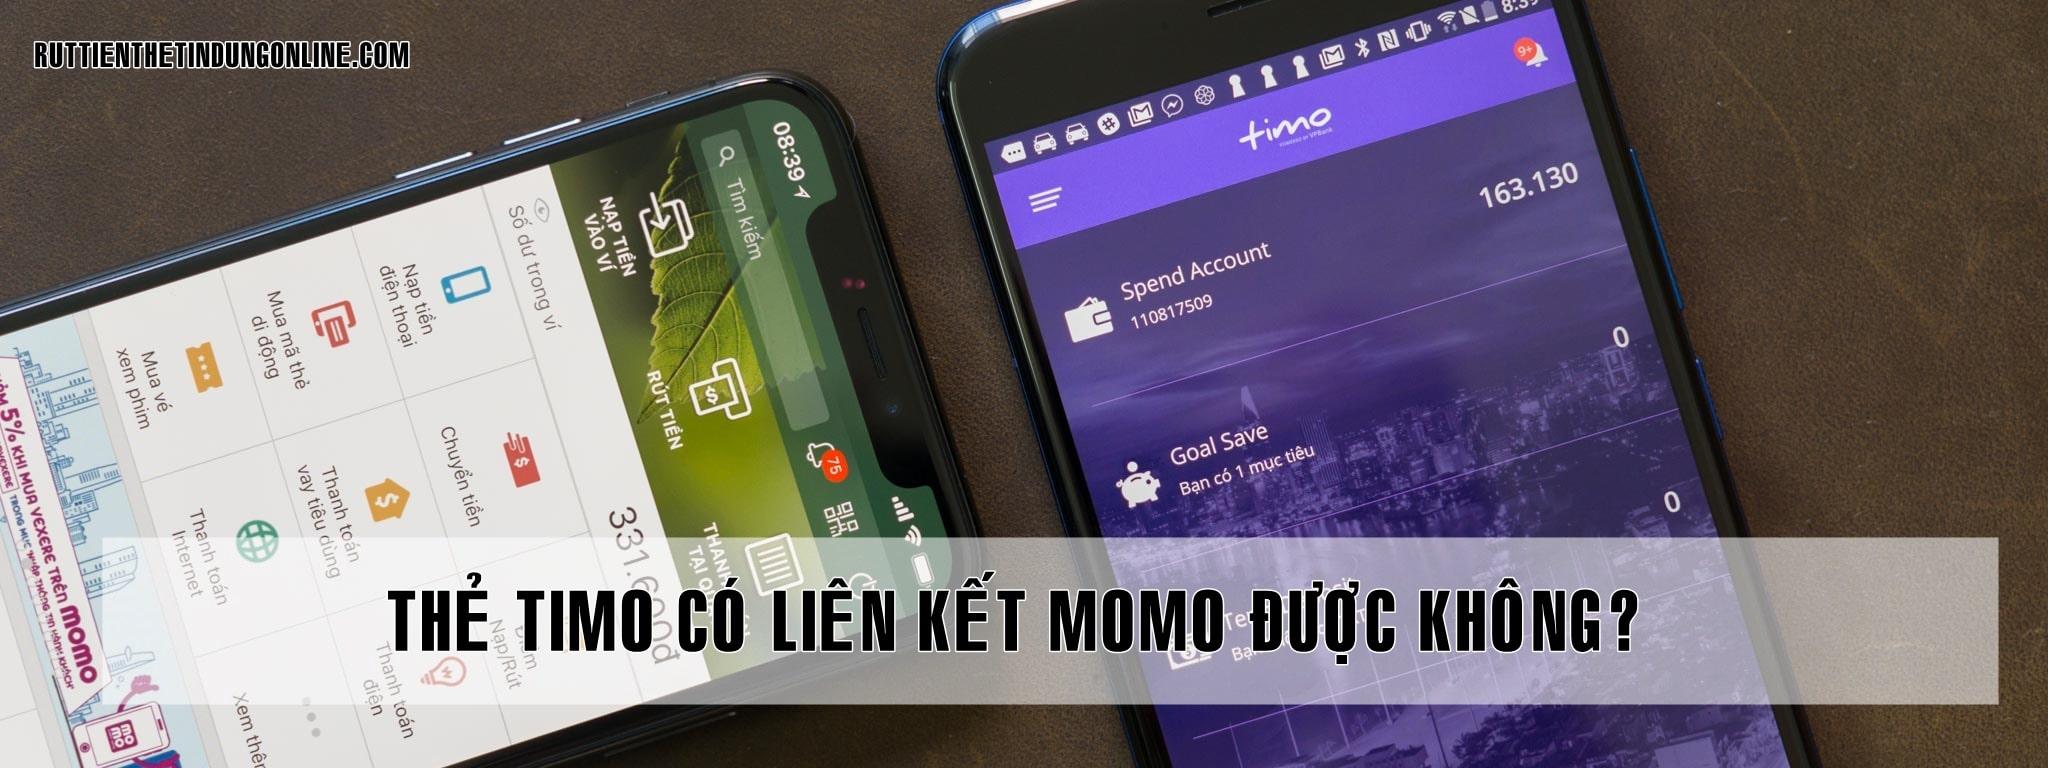 The timo co lien ket momo duoc khong